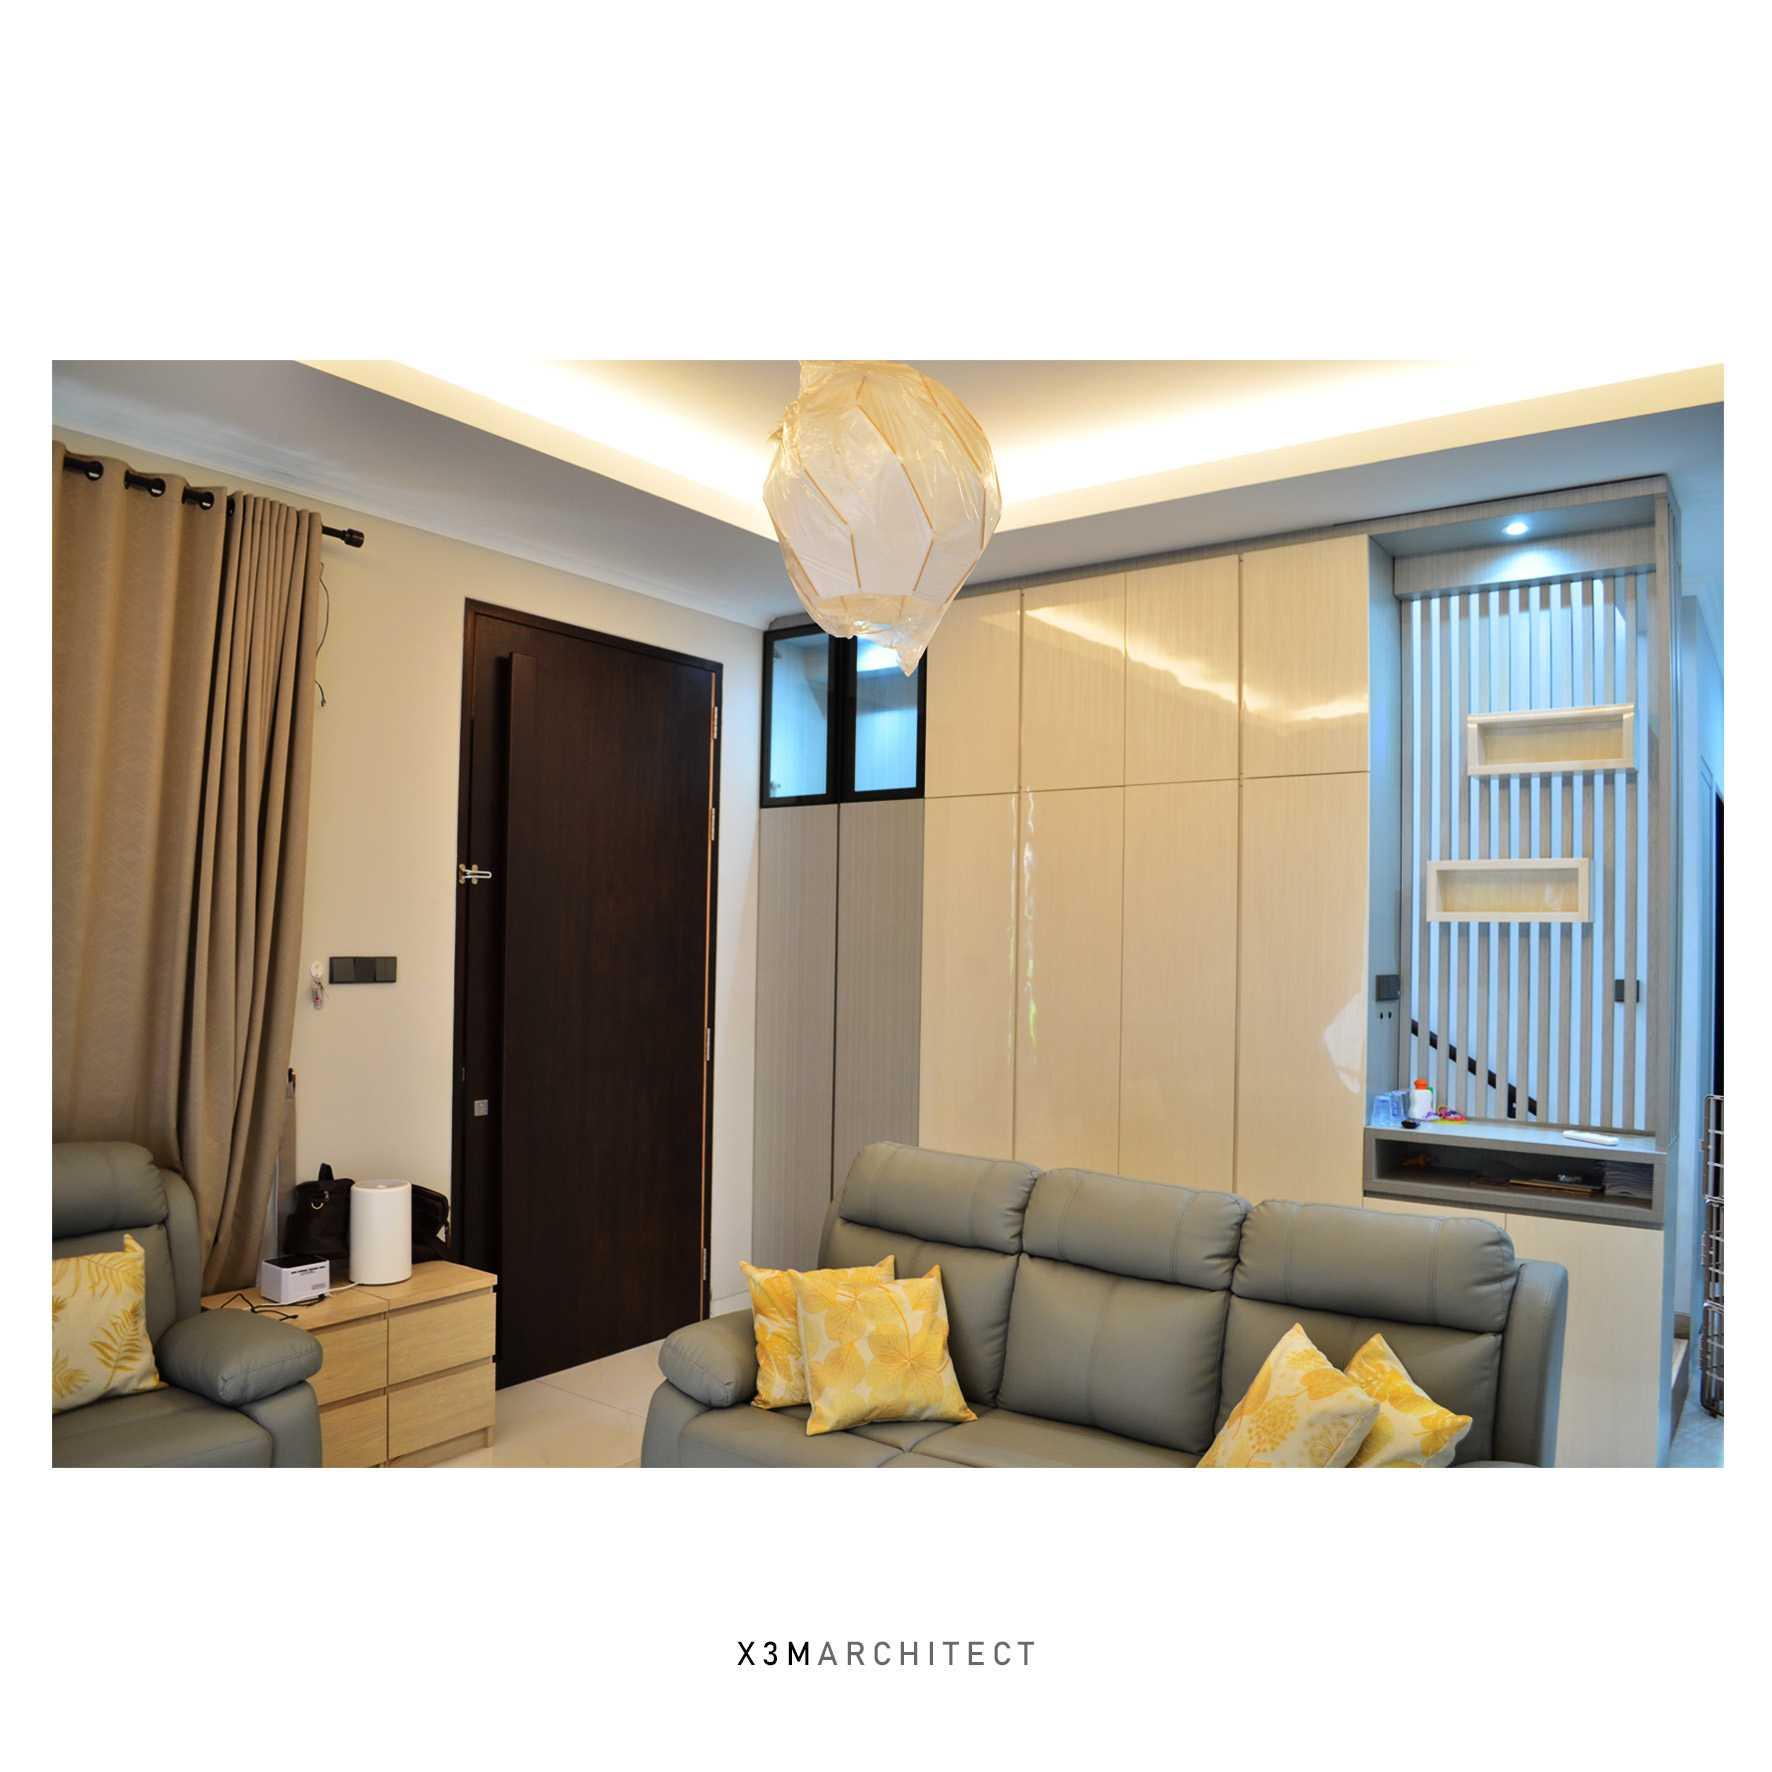 X3M Architects Nittaya A5 1 House Sampora, Kec. Cisauk, Tangerang, Banten 15345, Indonesia Sampora, Kec. Cisauk, Tangerang, Banten 15345, Indonesia X3M-Architects-Nittaya-A5-1-House   80362